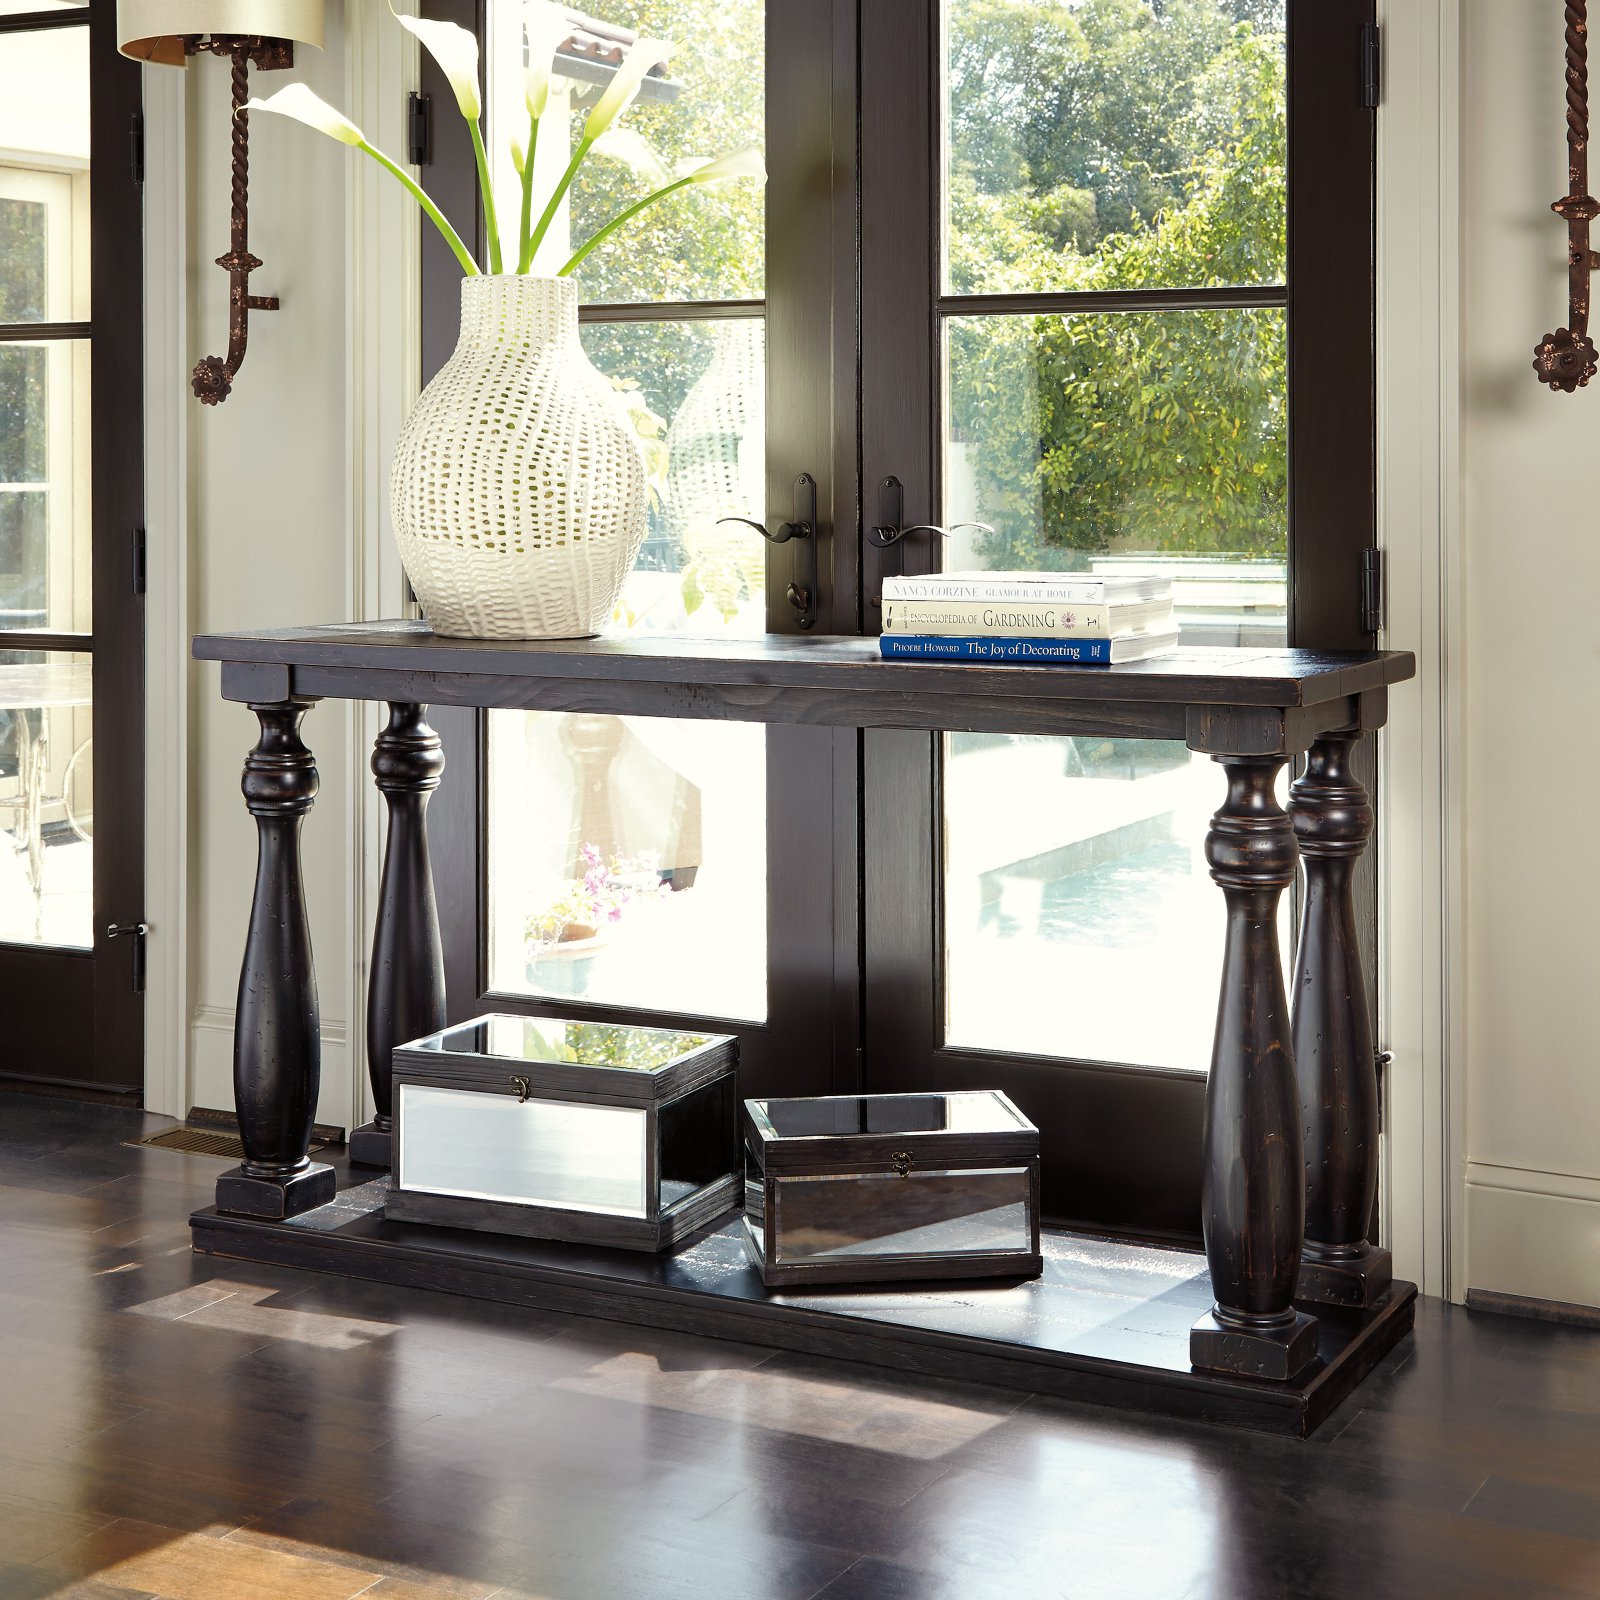 Signature Design by Ashley Mallacar Sofa Table by Ashley Furniture